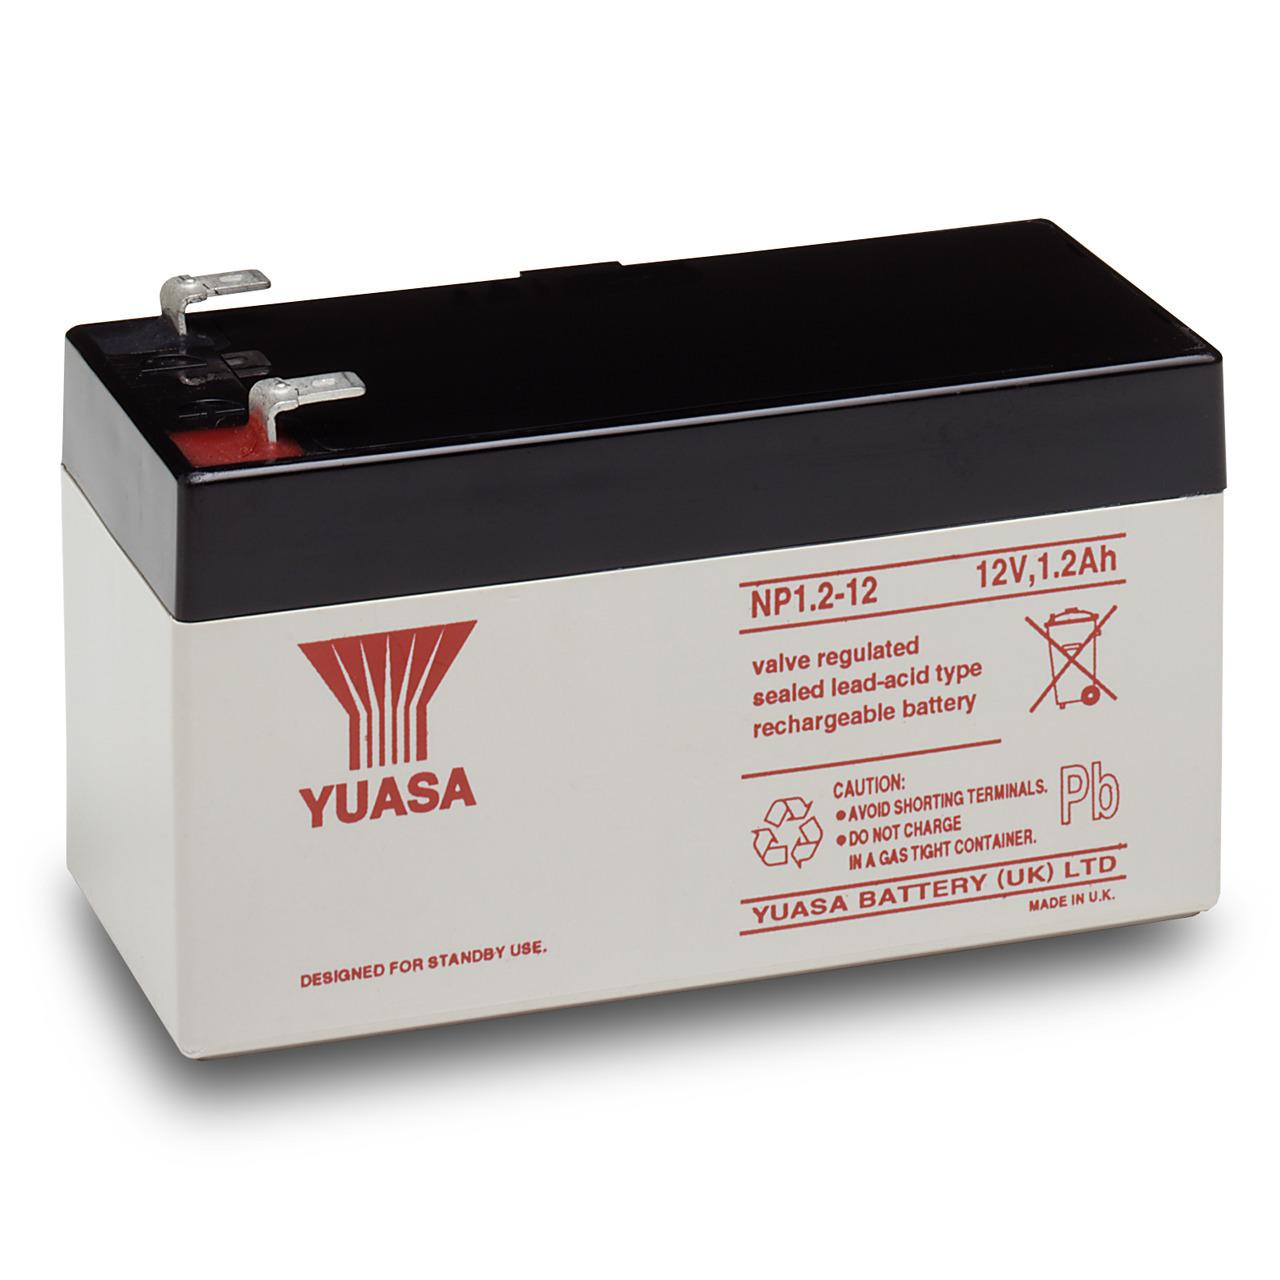 yuasa AGM Bleiakku NP1-2-12 mit VdS- Fastonkontakt 4-8mm- 12 V - 1-2 Ah